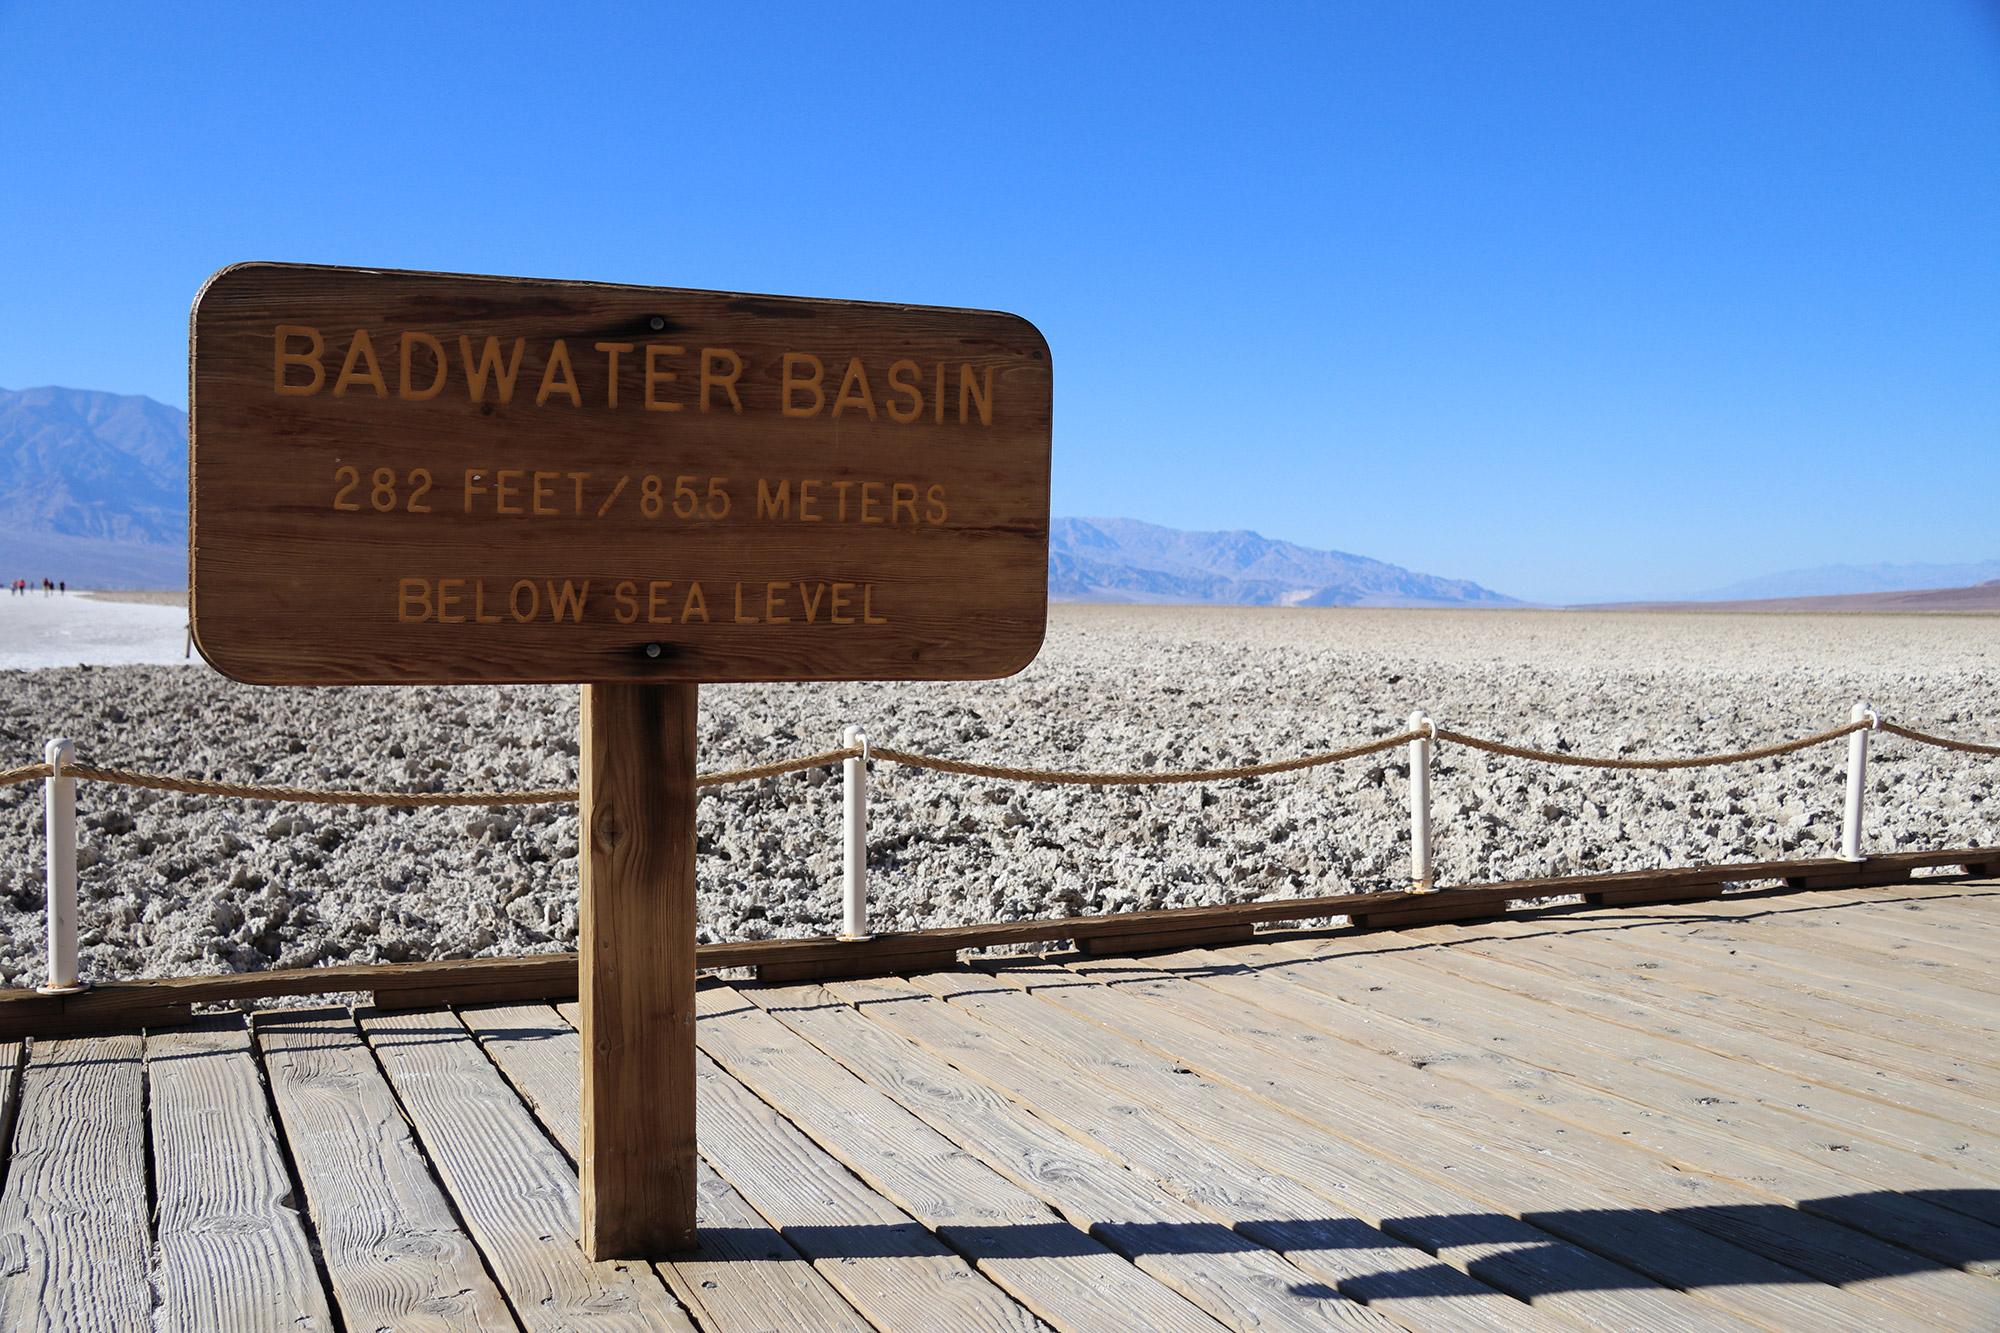 Amerika dag 18 - Death Valley National Park - Badwater